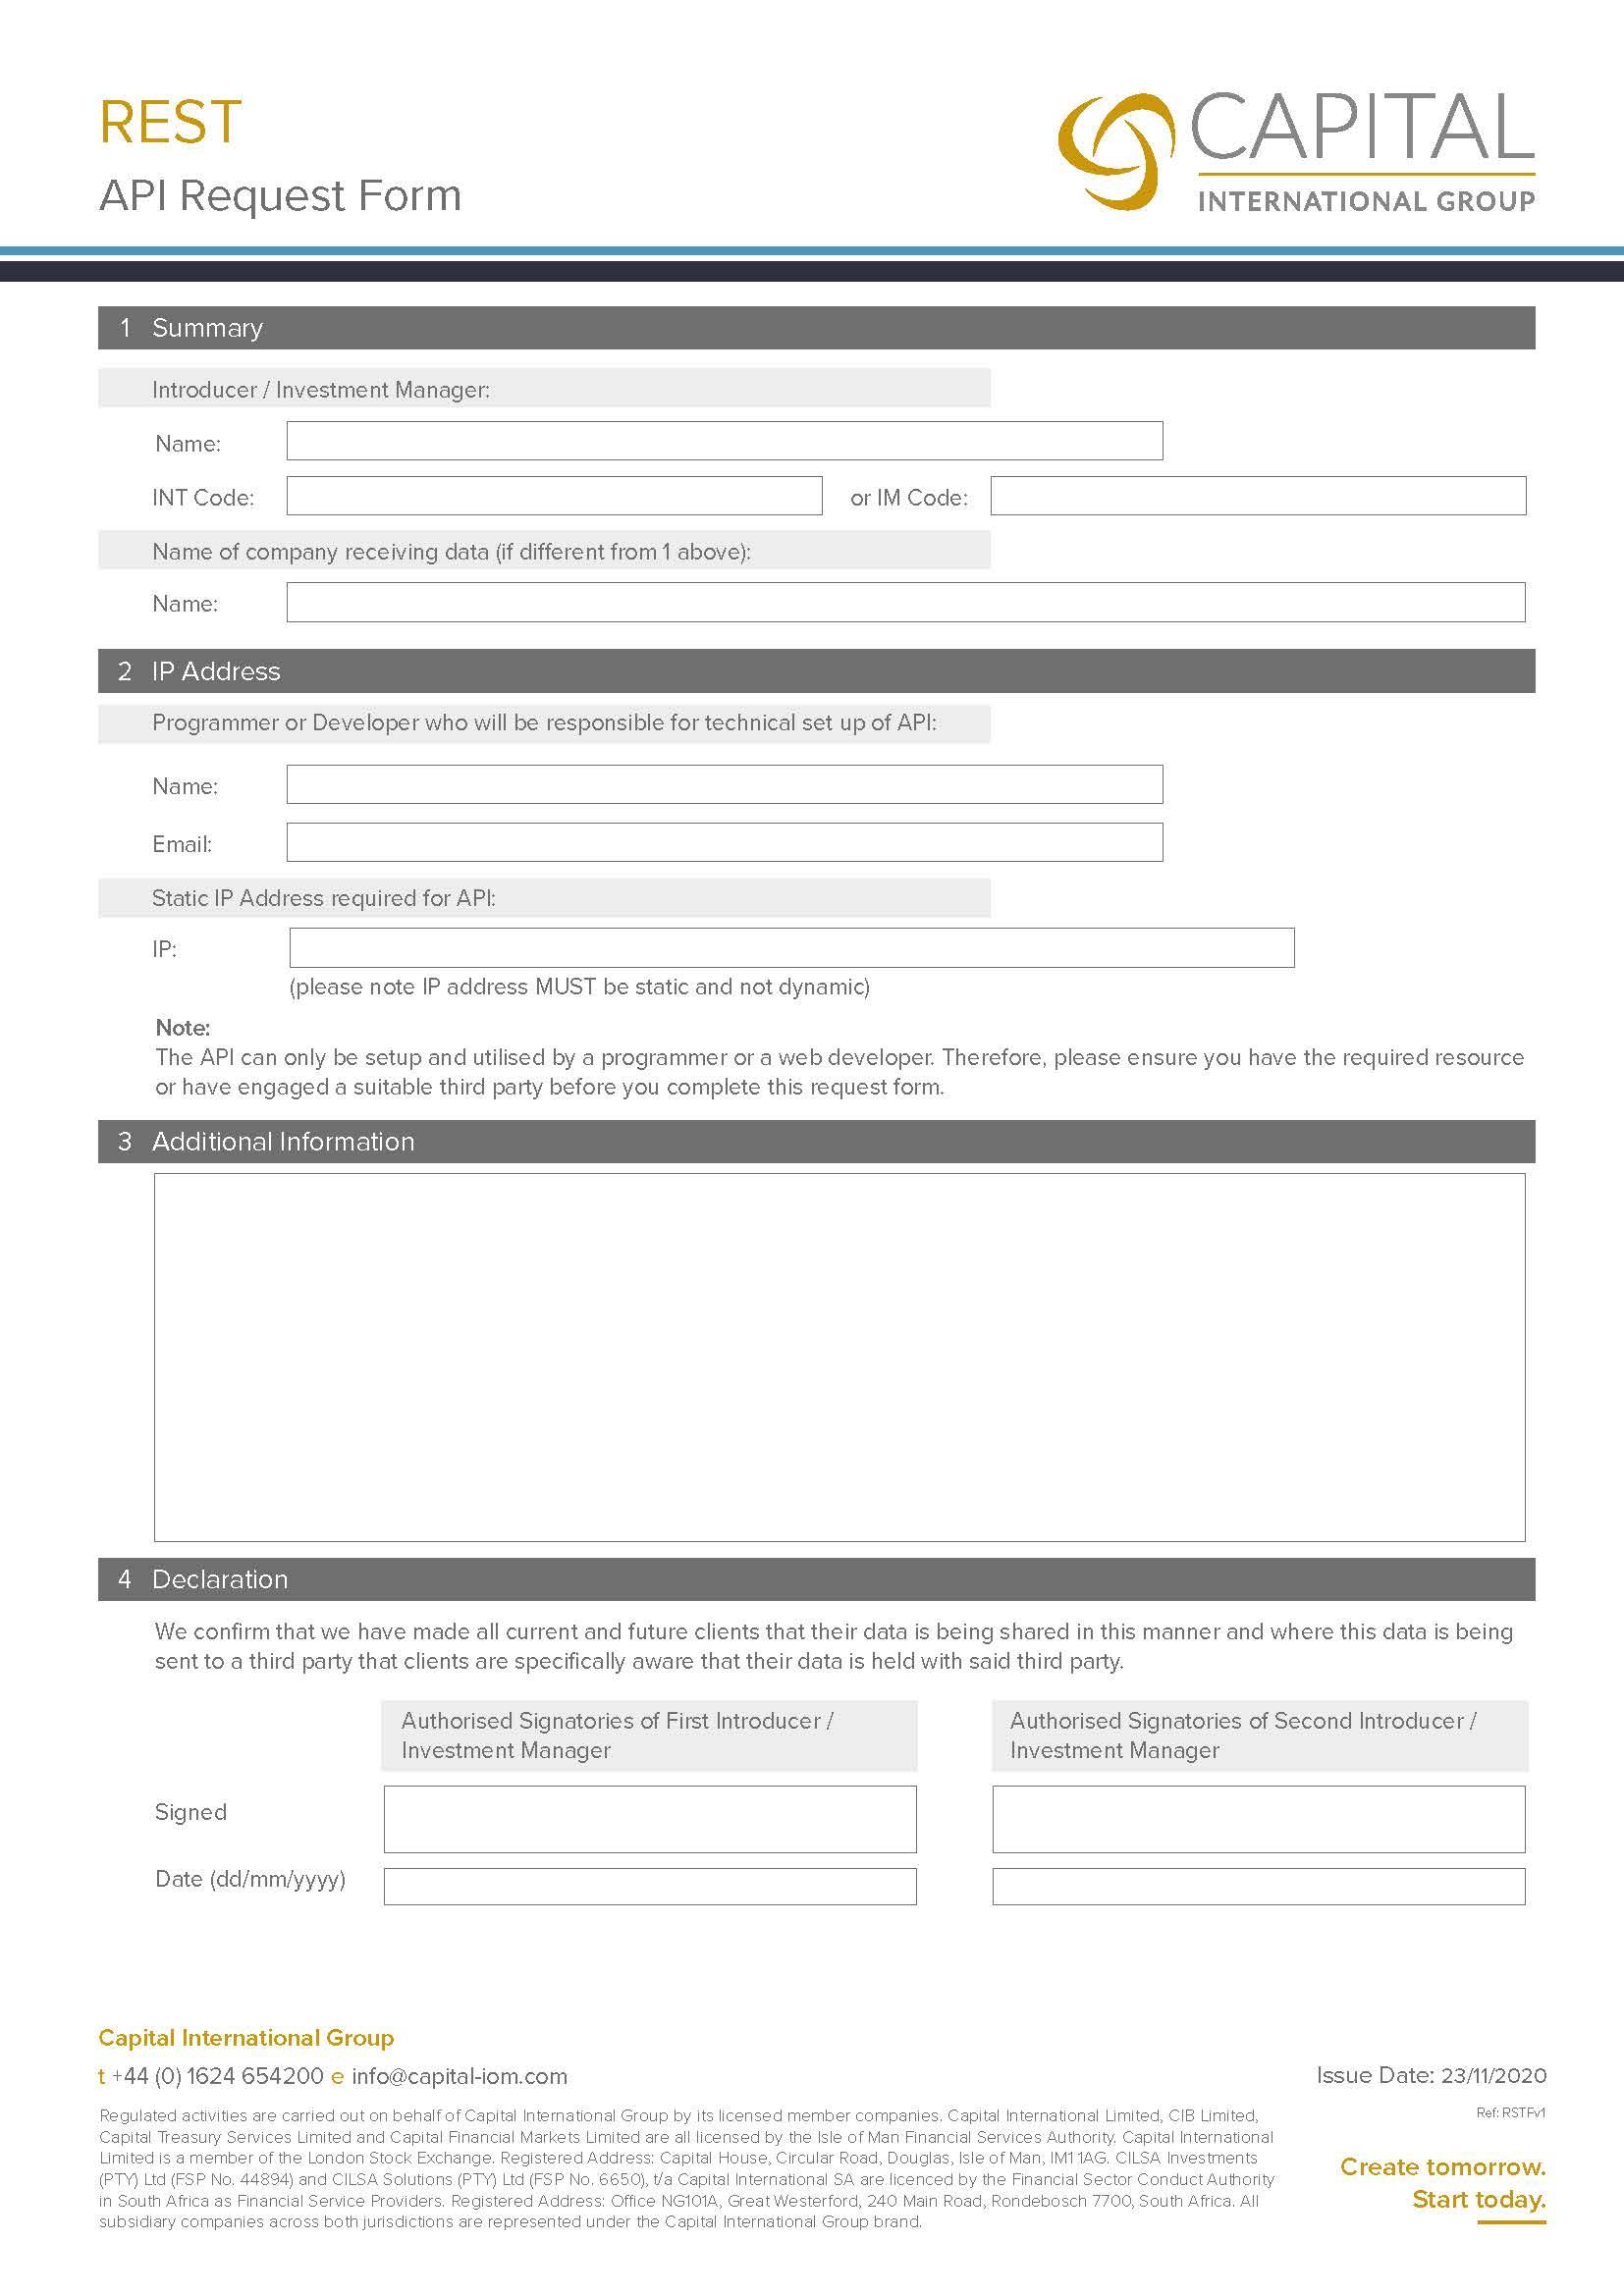 REST API Request Form